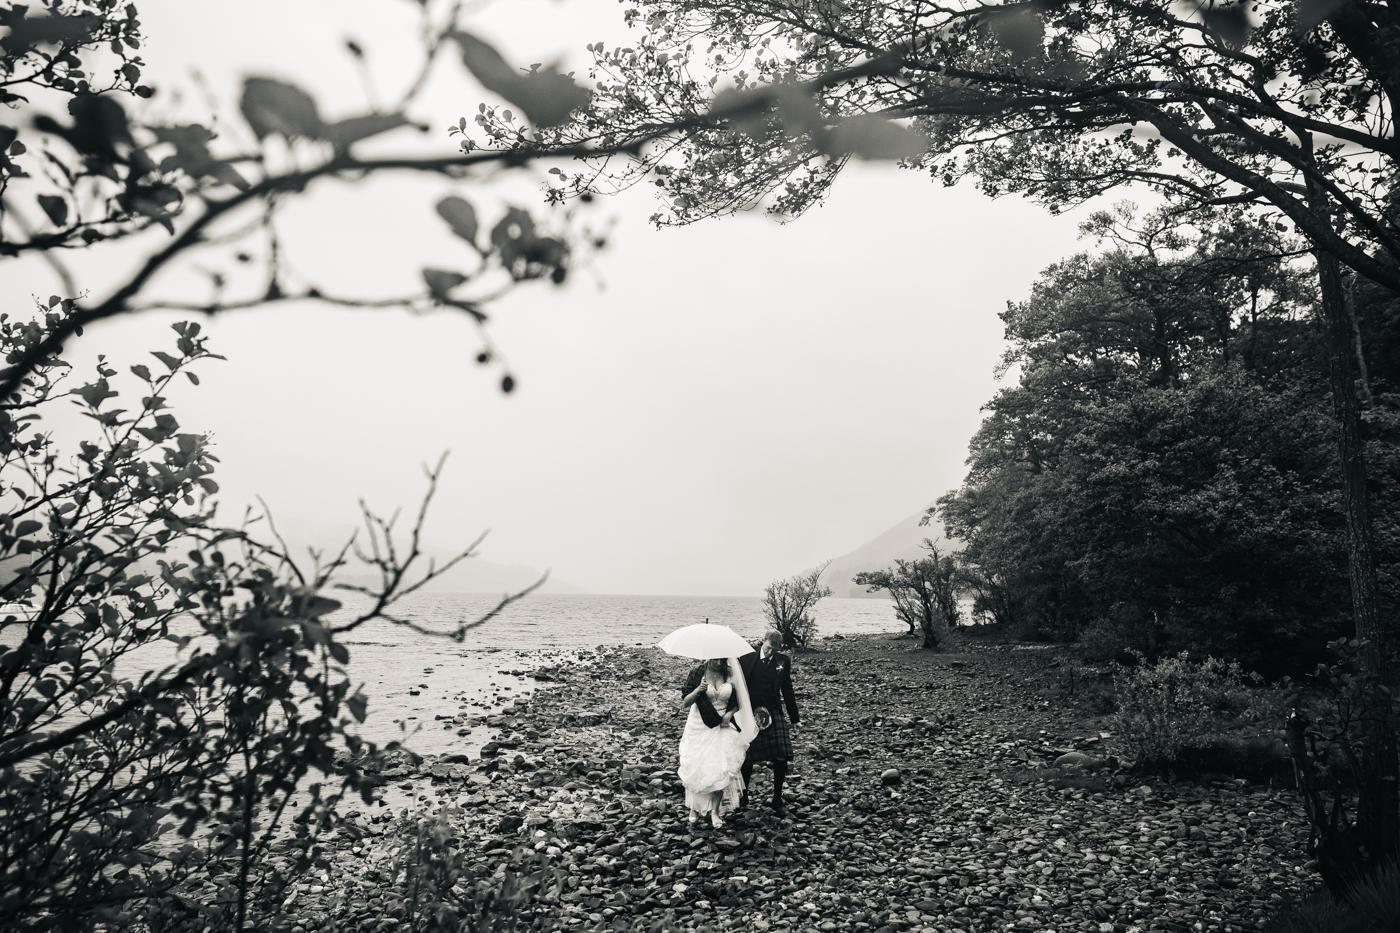 scottish-wedding-trossachs-loch-tay-highlannds-relaxed-photography-photographer-0031.jpg